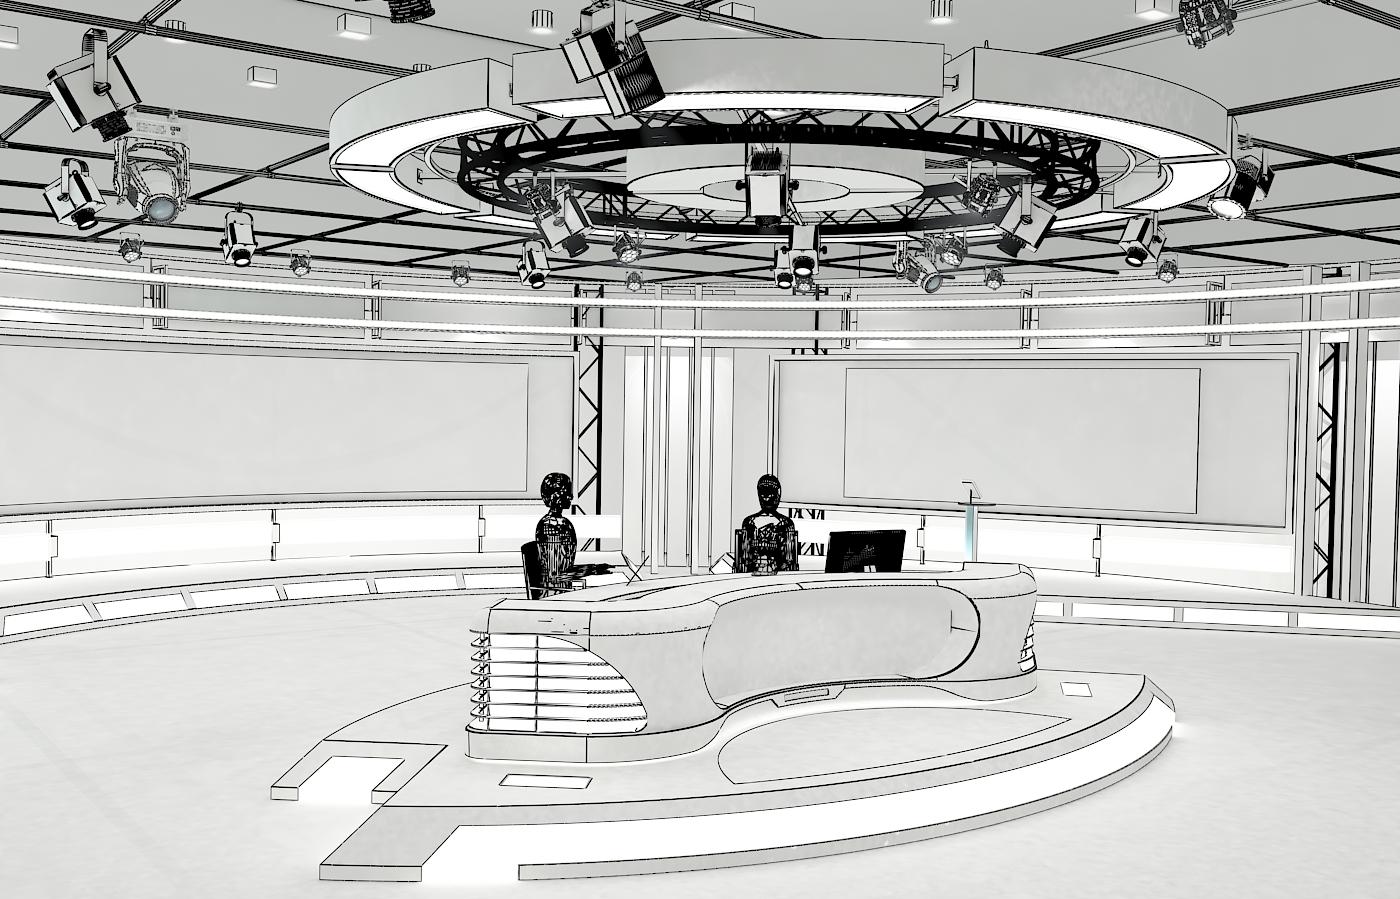 виртуал телевизийн студи цуглуулга vol 6 3d загвар max dxf dwg fbx obj 223370